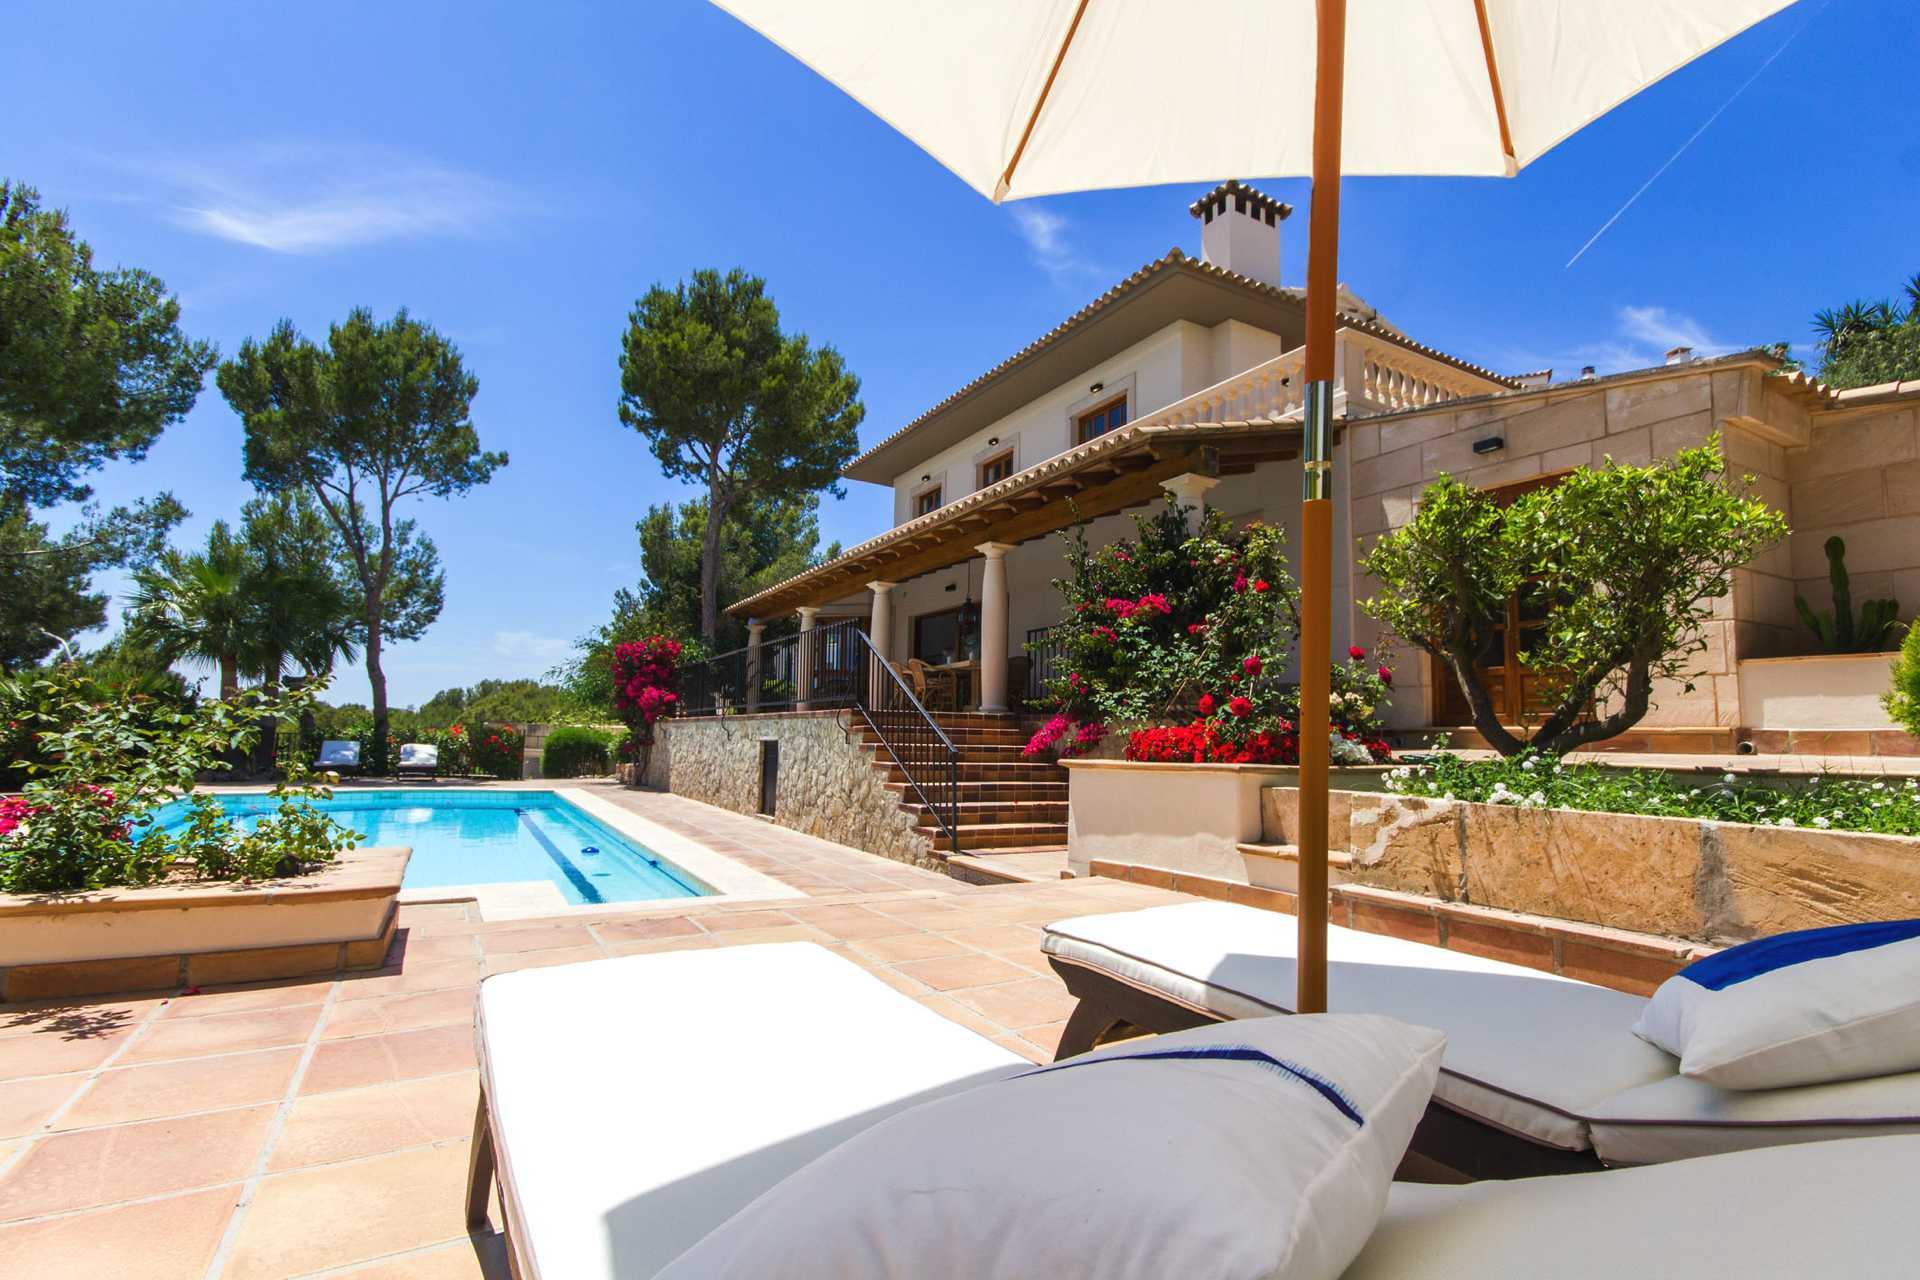 01-305 romantische Villa Südwesten Mallorca Bild 3